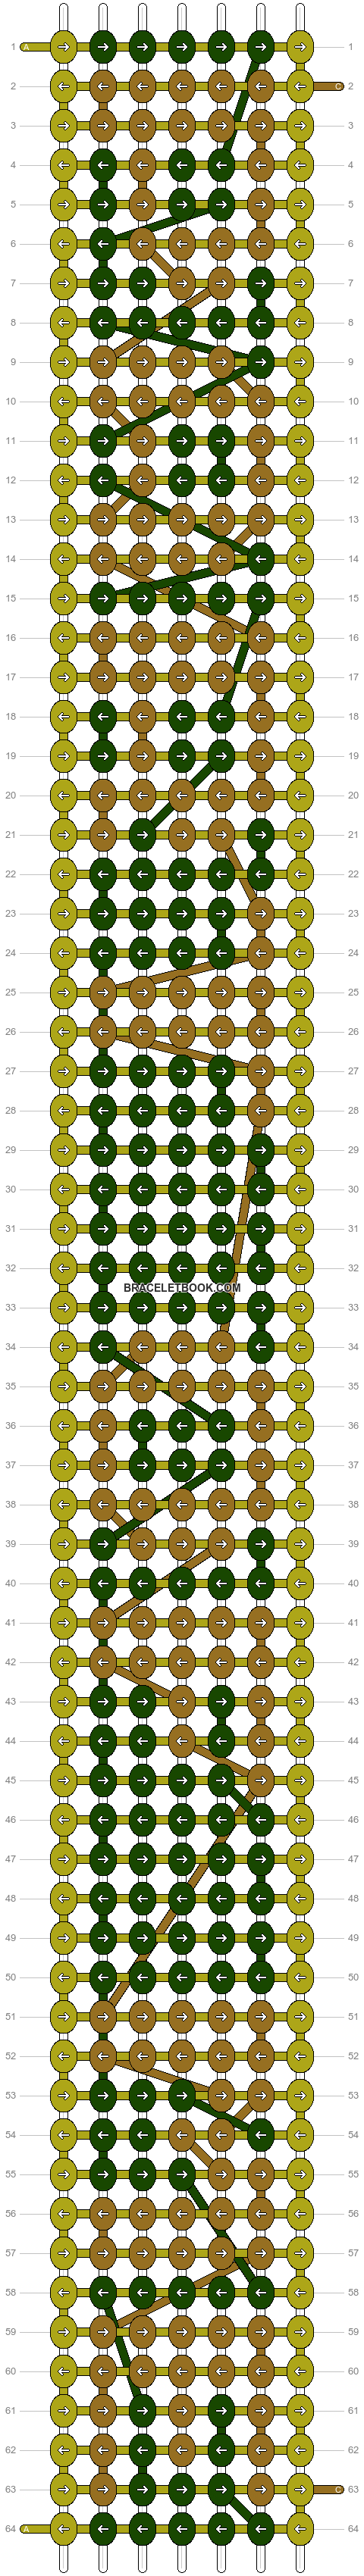 Alpha pattern #6430 pattern